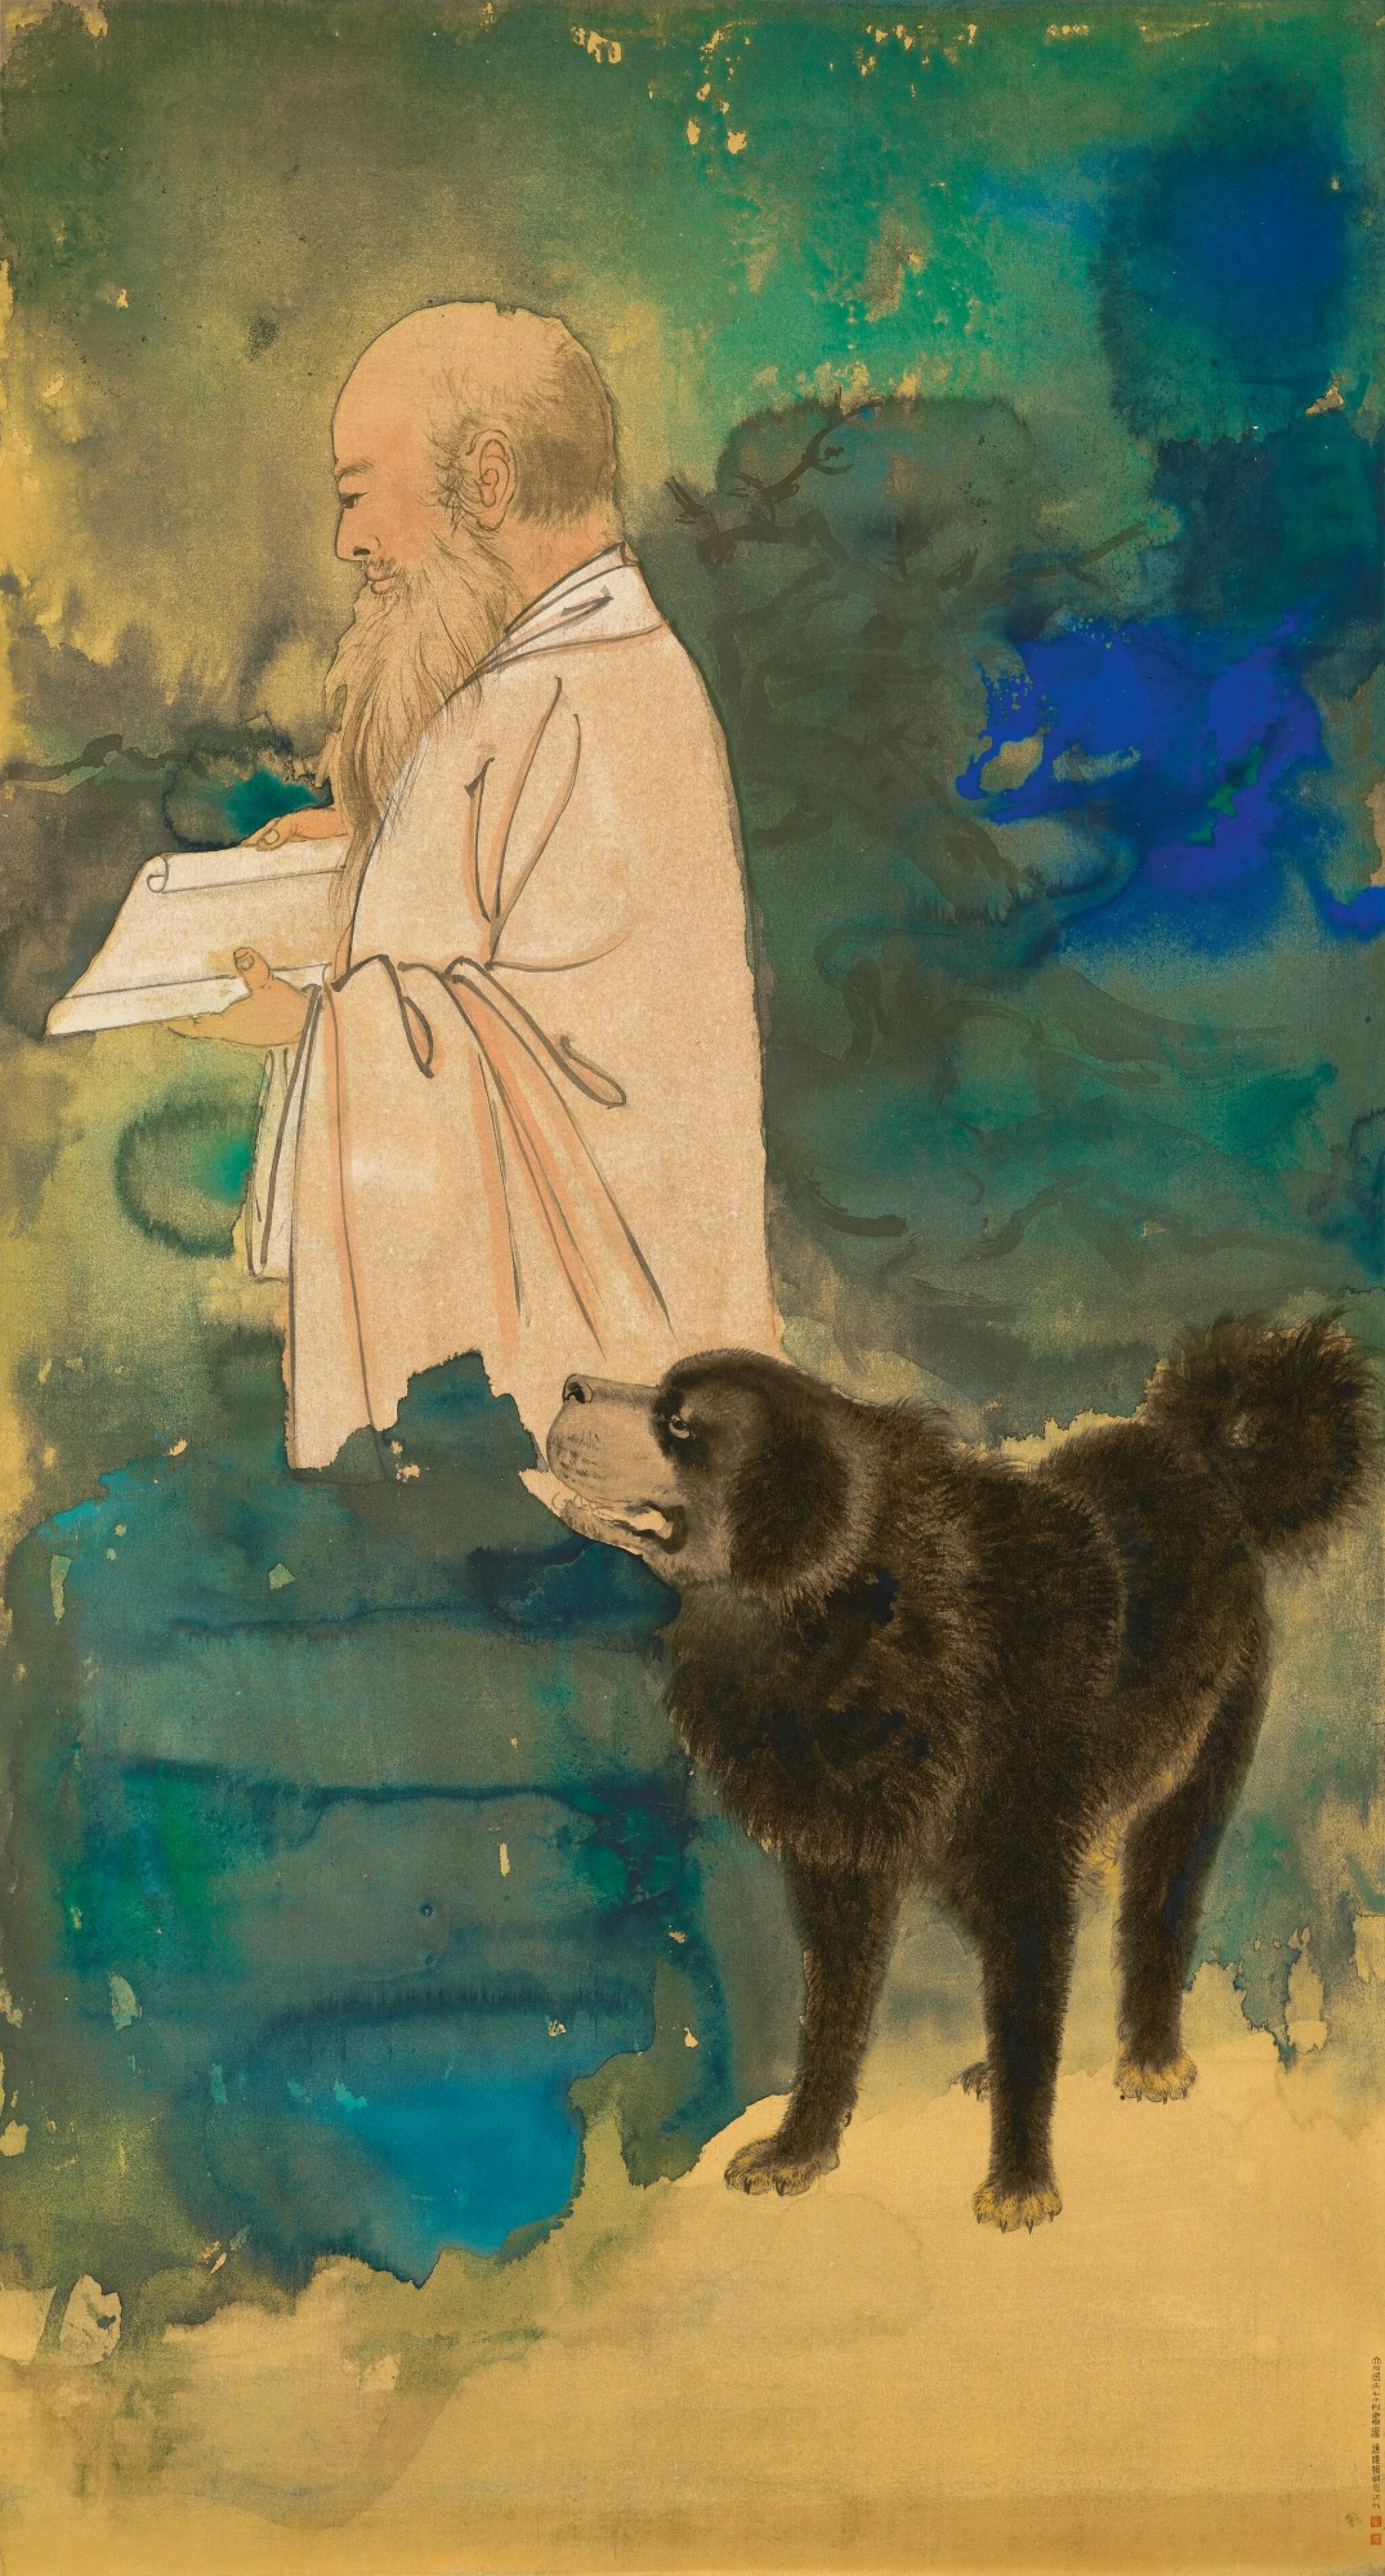 View full screen - View 1 of Lot 8003. Zhang Daqian, Self Portrait with a Tibetan Mastiff ︳張大千  自畫像與黑虎.